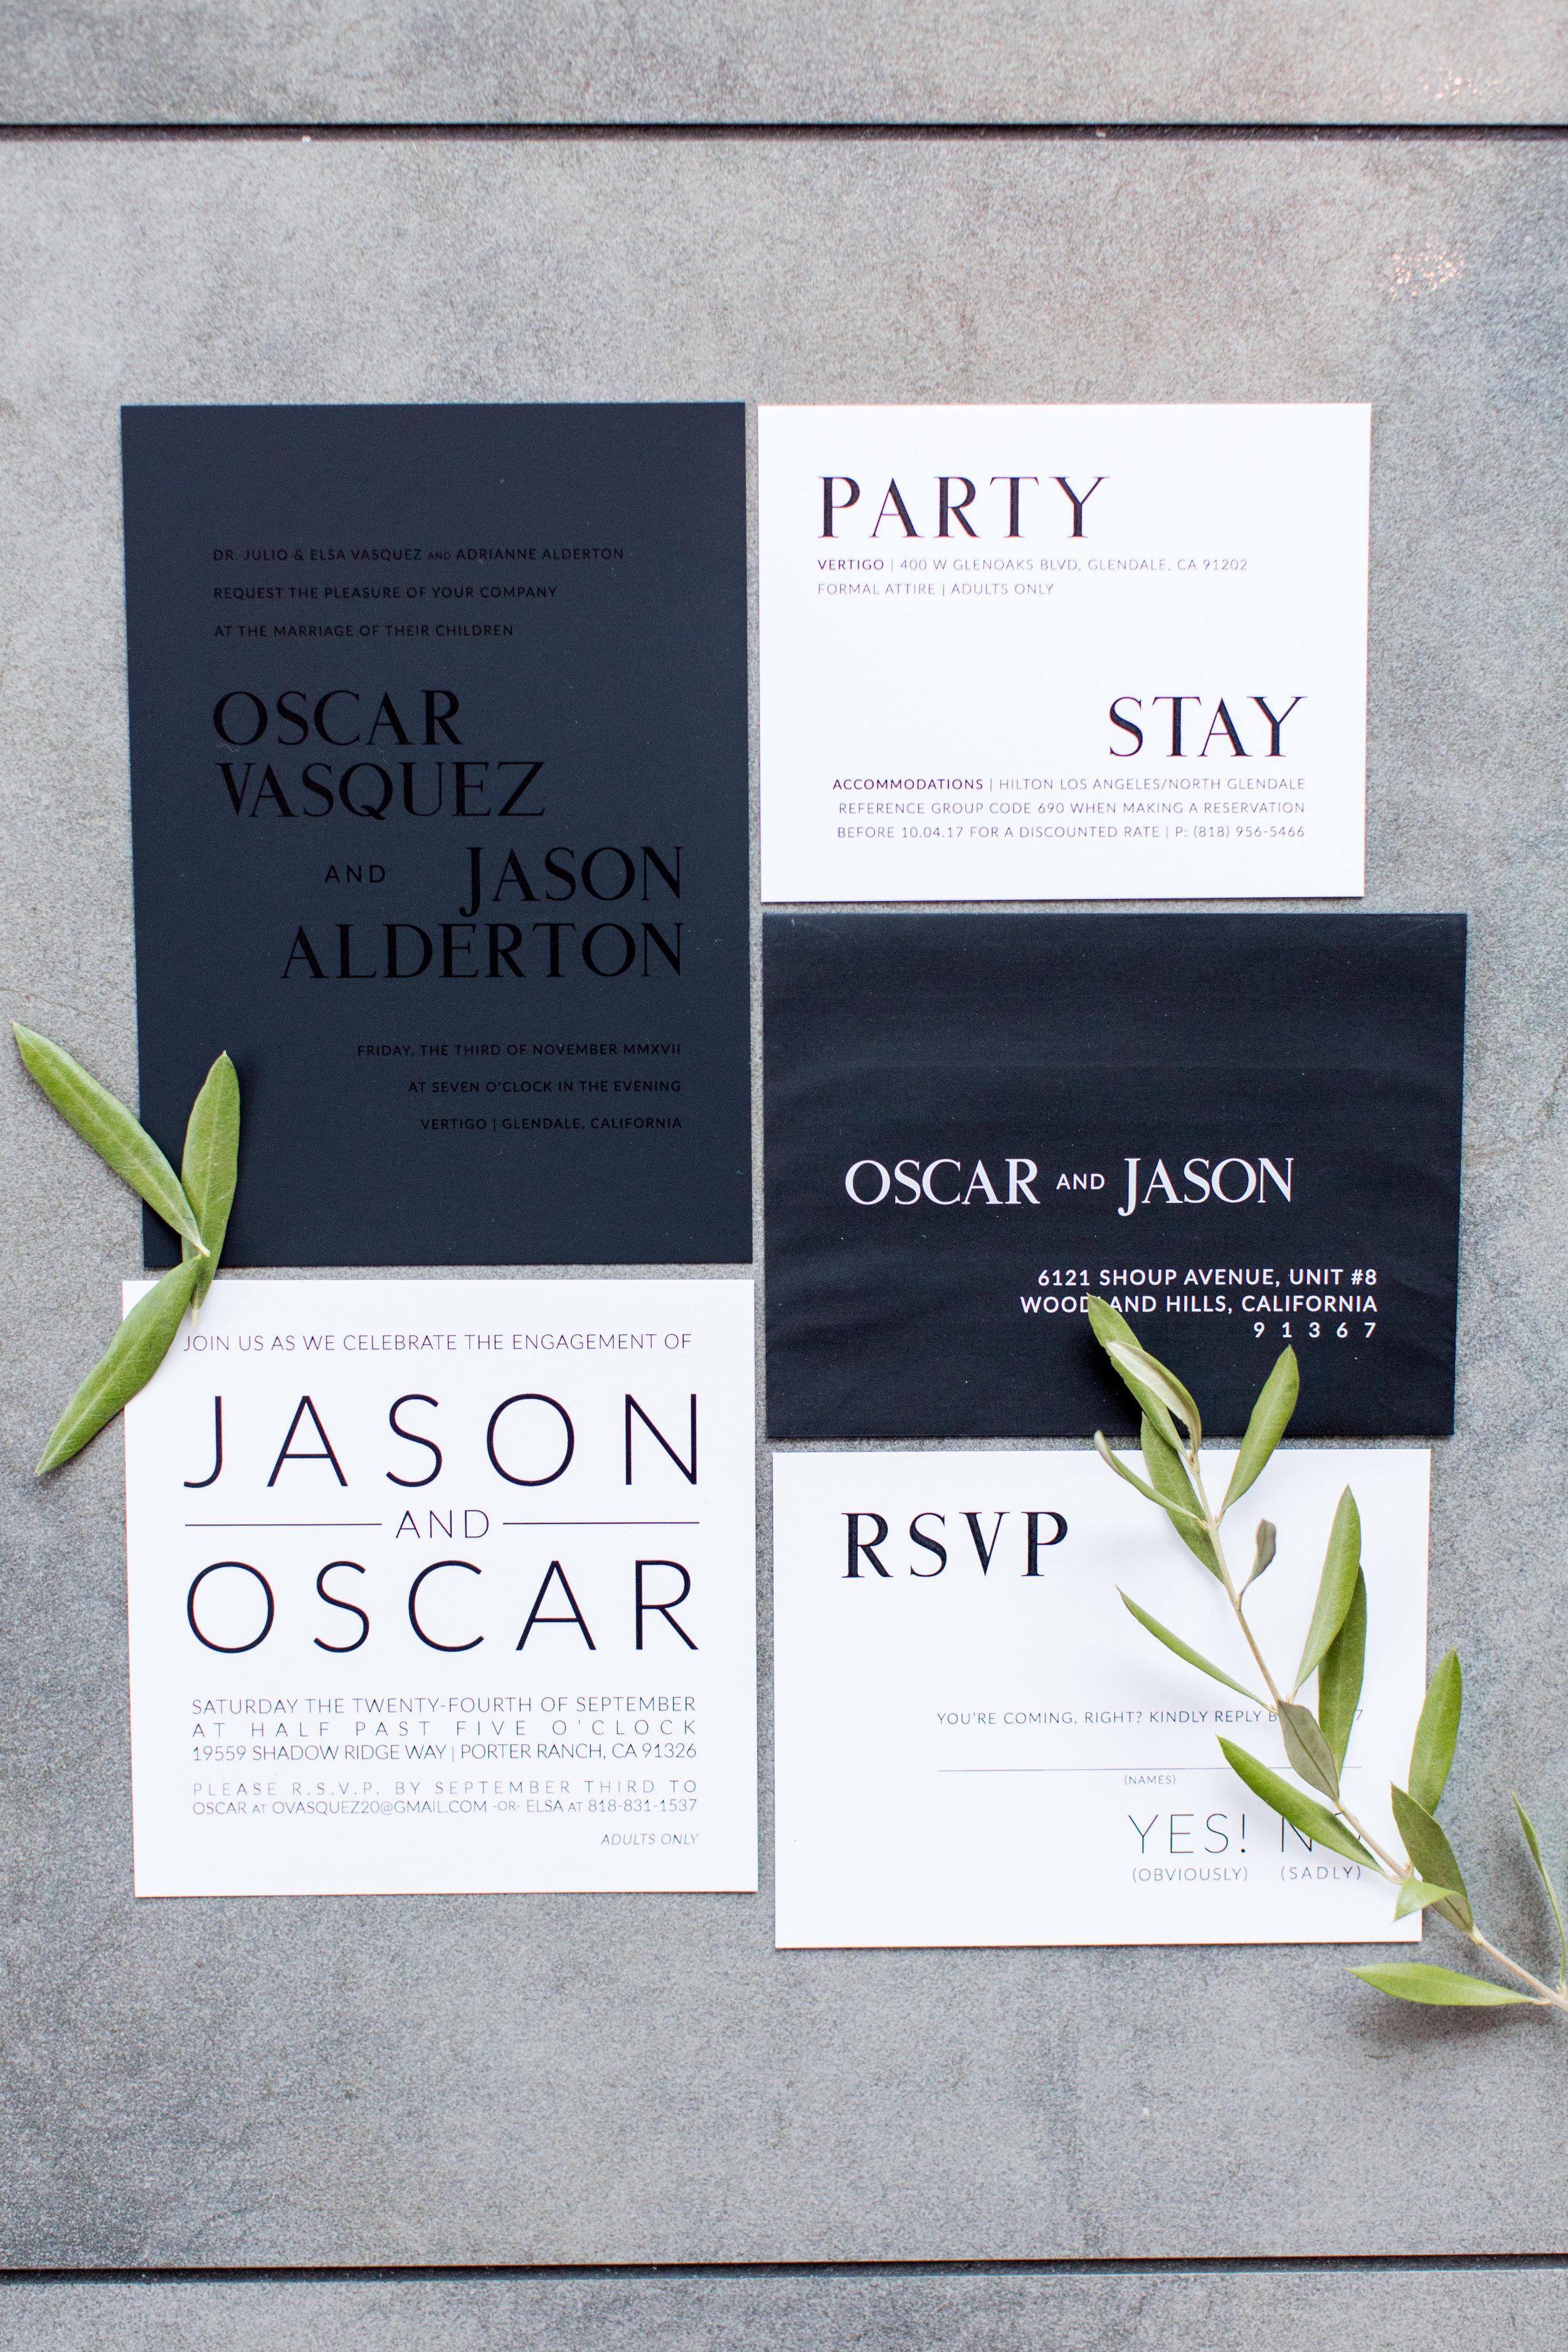 Oscar&Jason_Wedding11.03.17_MichelleKylePhotography-2.jpg